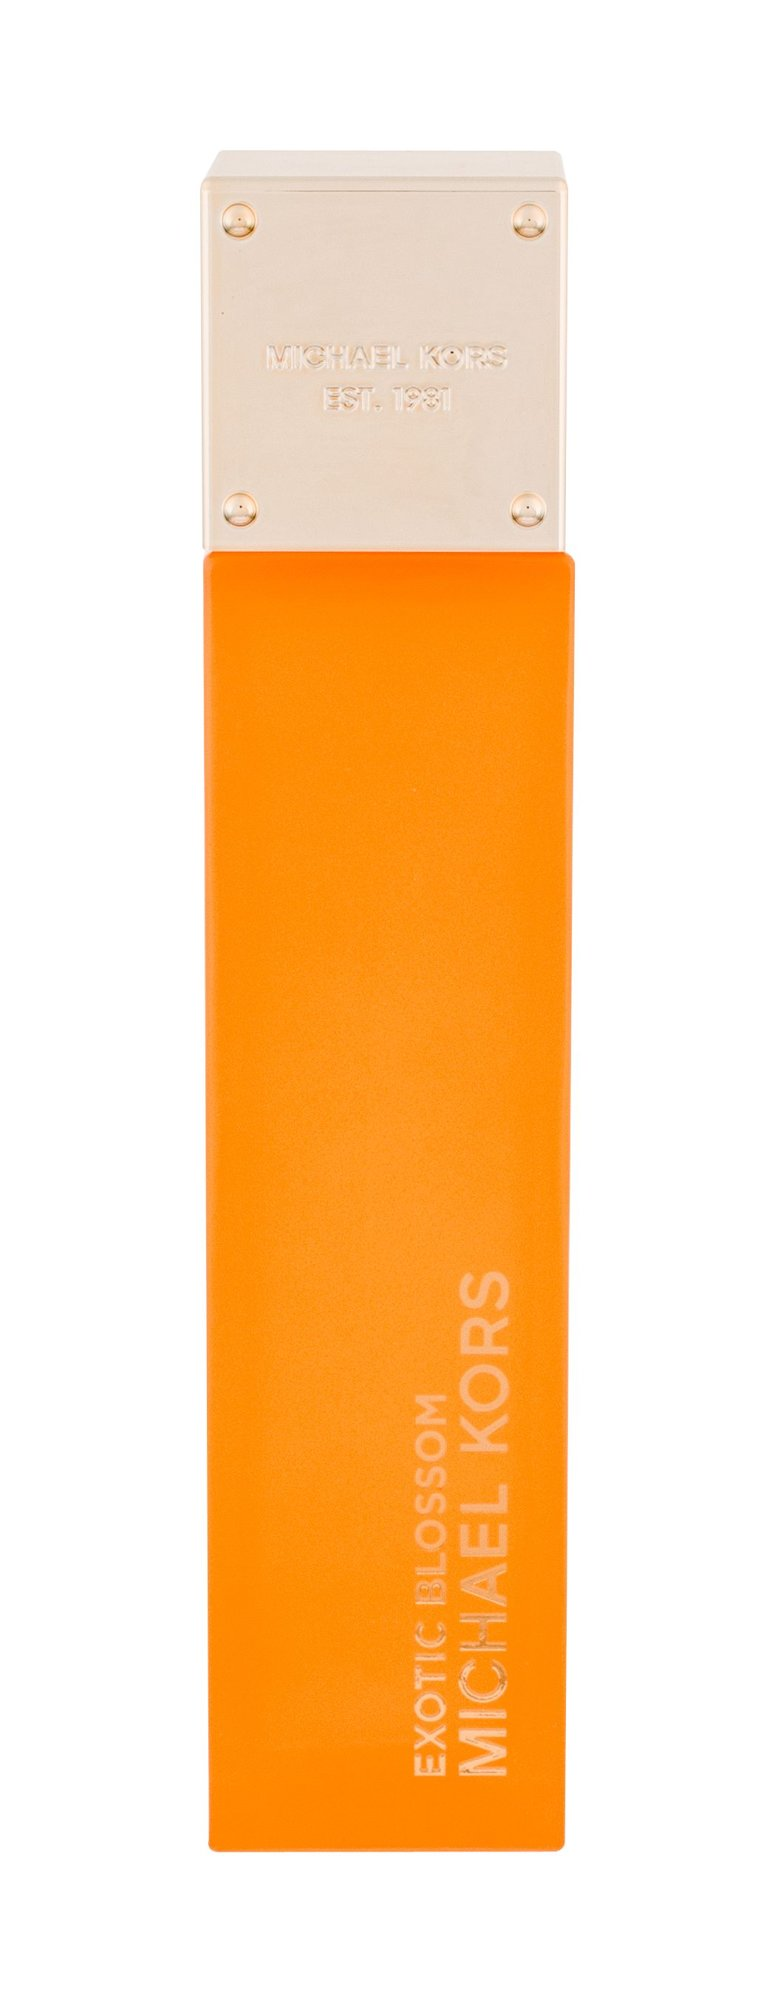 Michael Kors Exotic Blossom, Parfumovaná voda 100ml